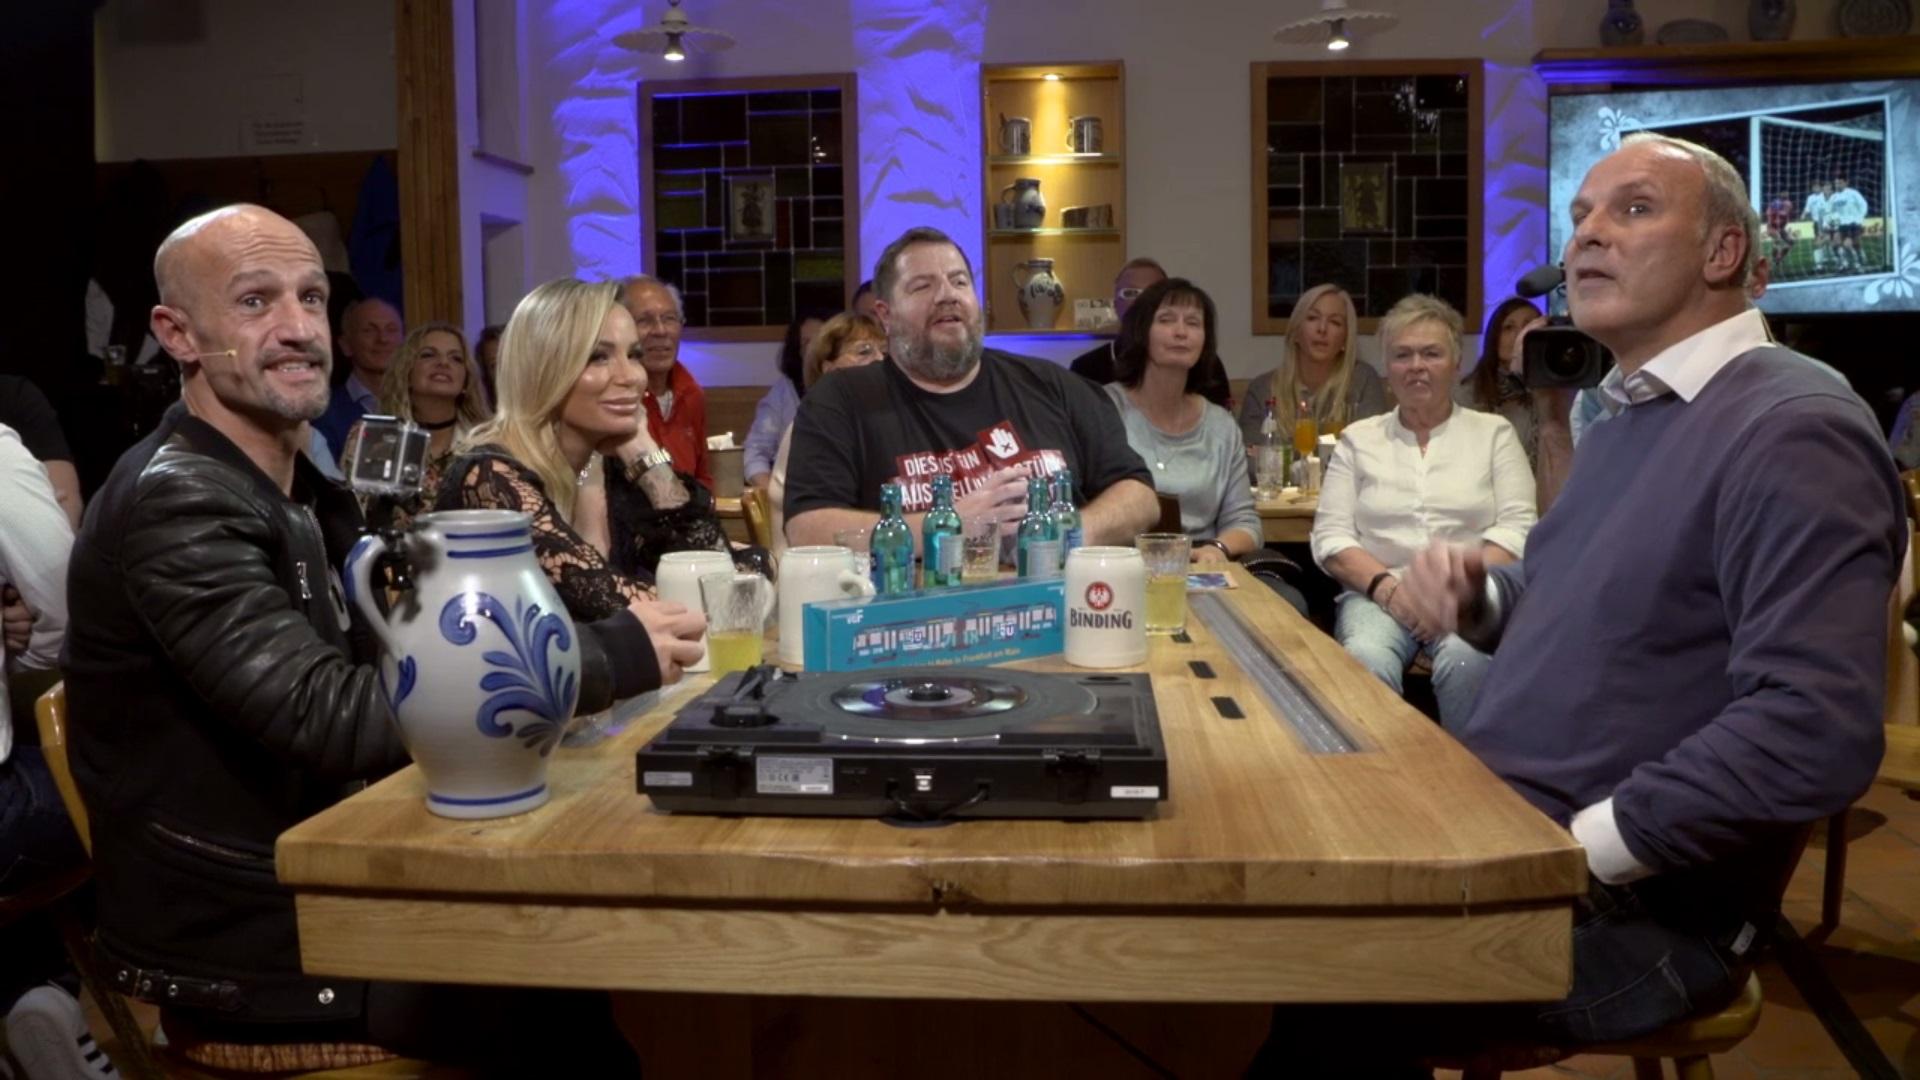 Bembel & Gebabbel – Folge 39 mit Oliver Reck, Gina Lisa Lohfink & Peyman Amin